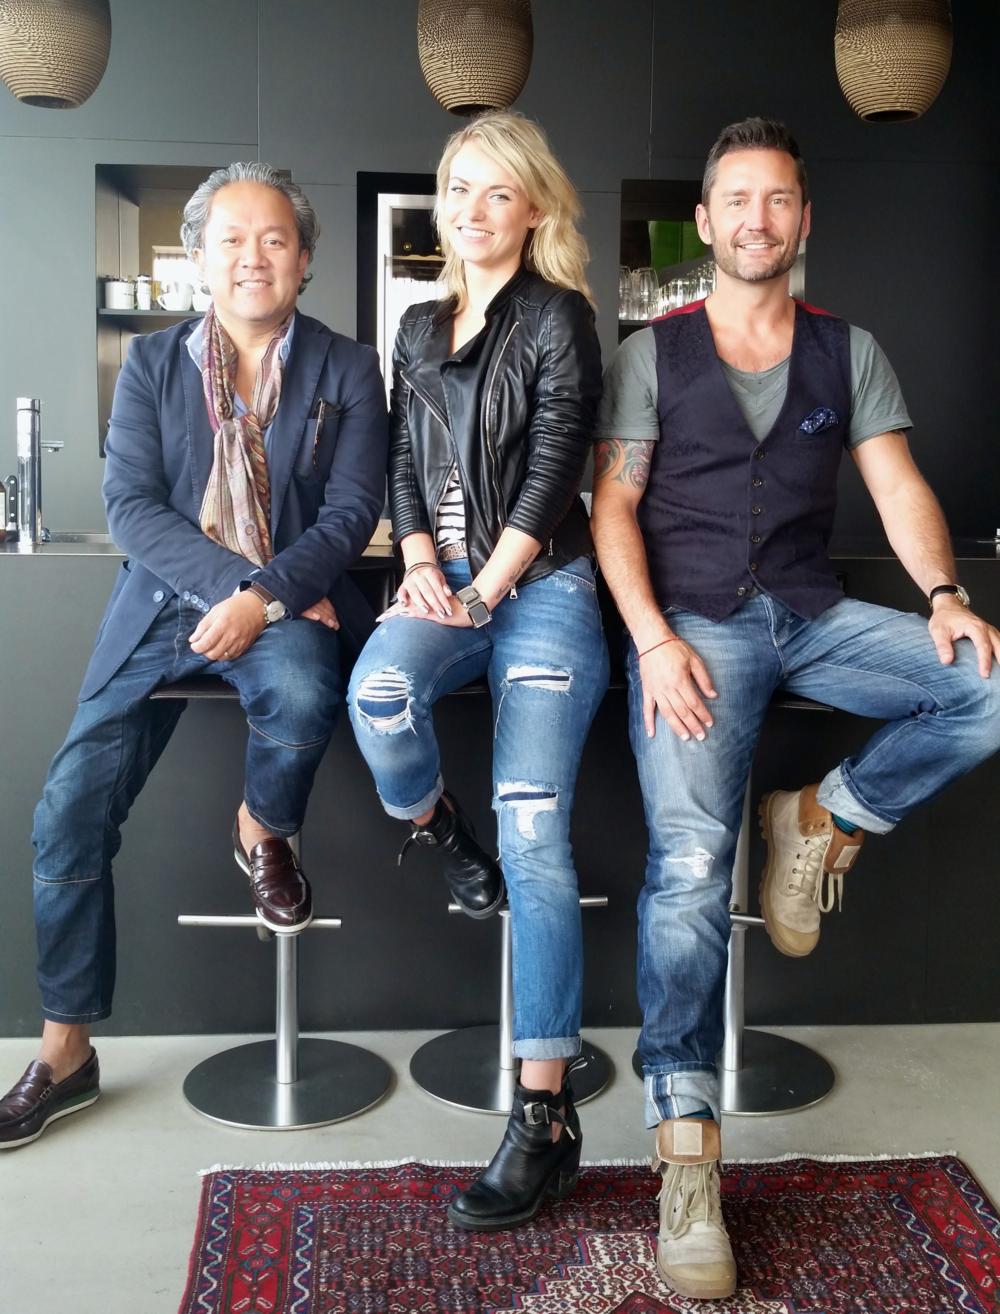 Chris Lapperre, Maryse Pothoven & Bas van den Broecke